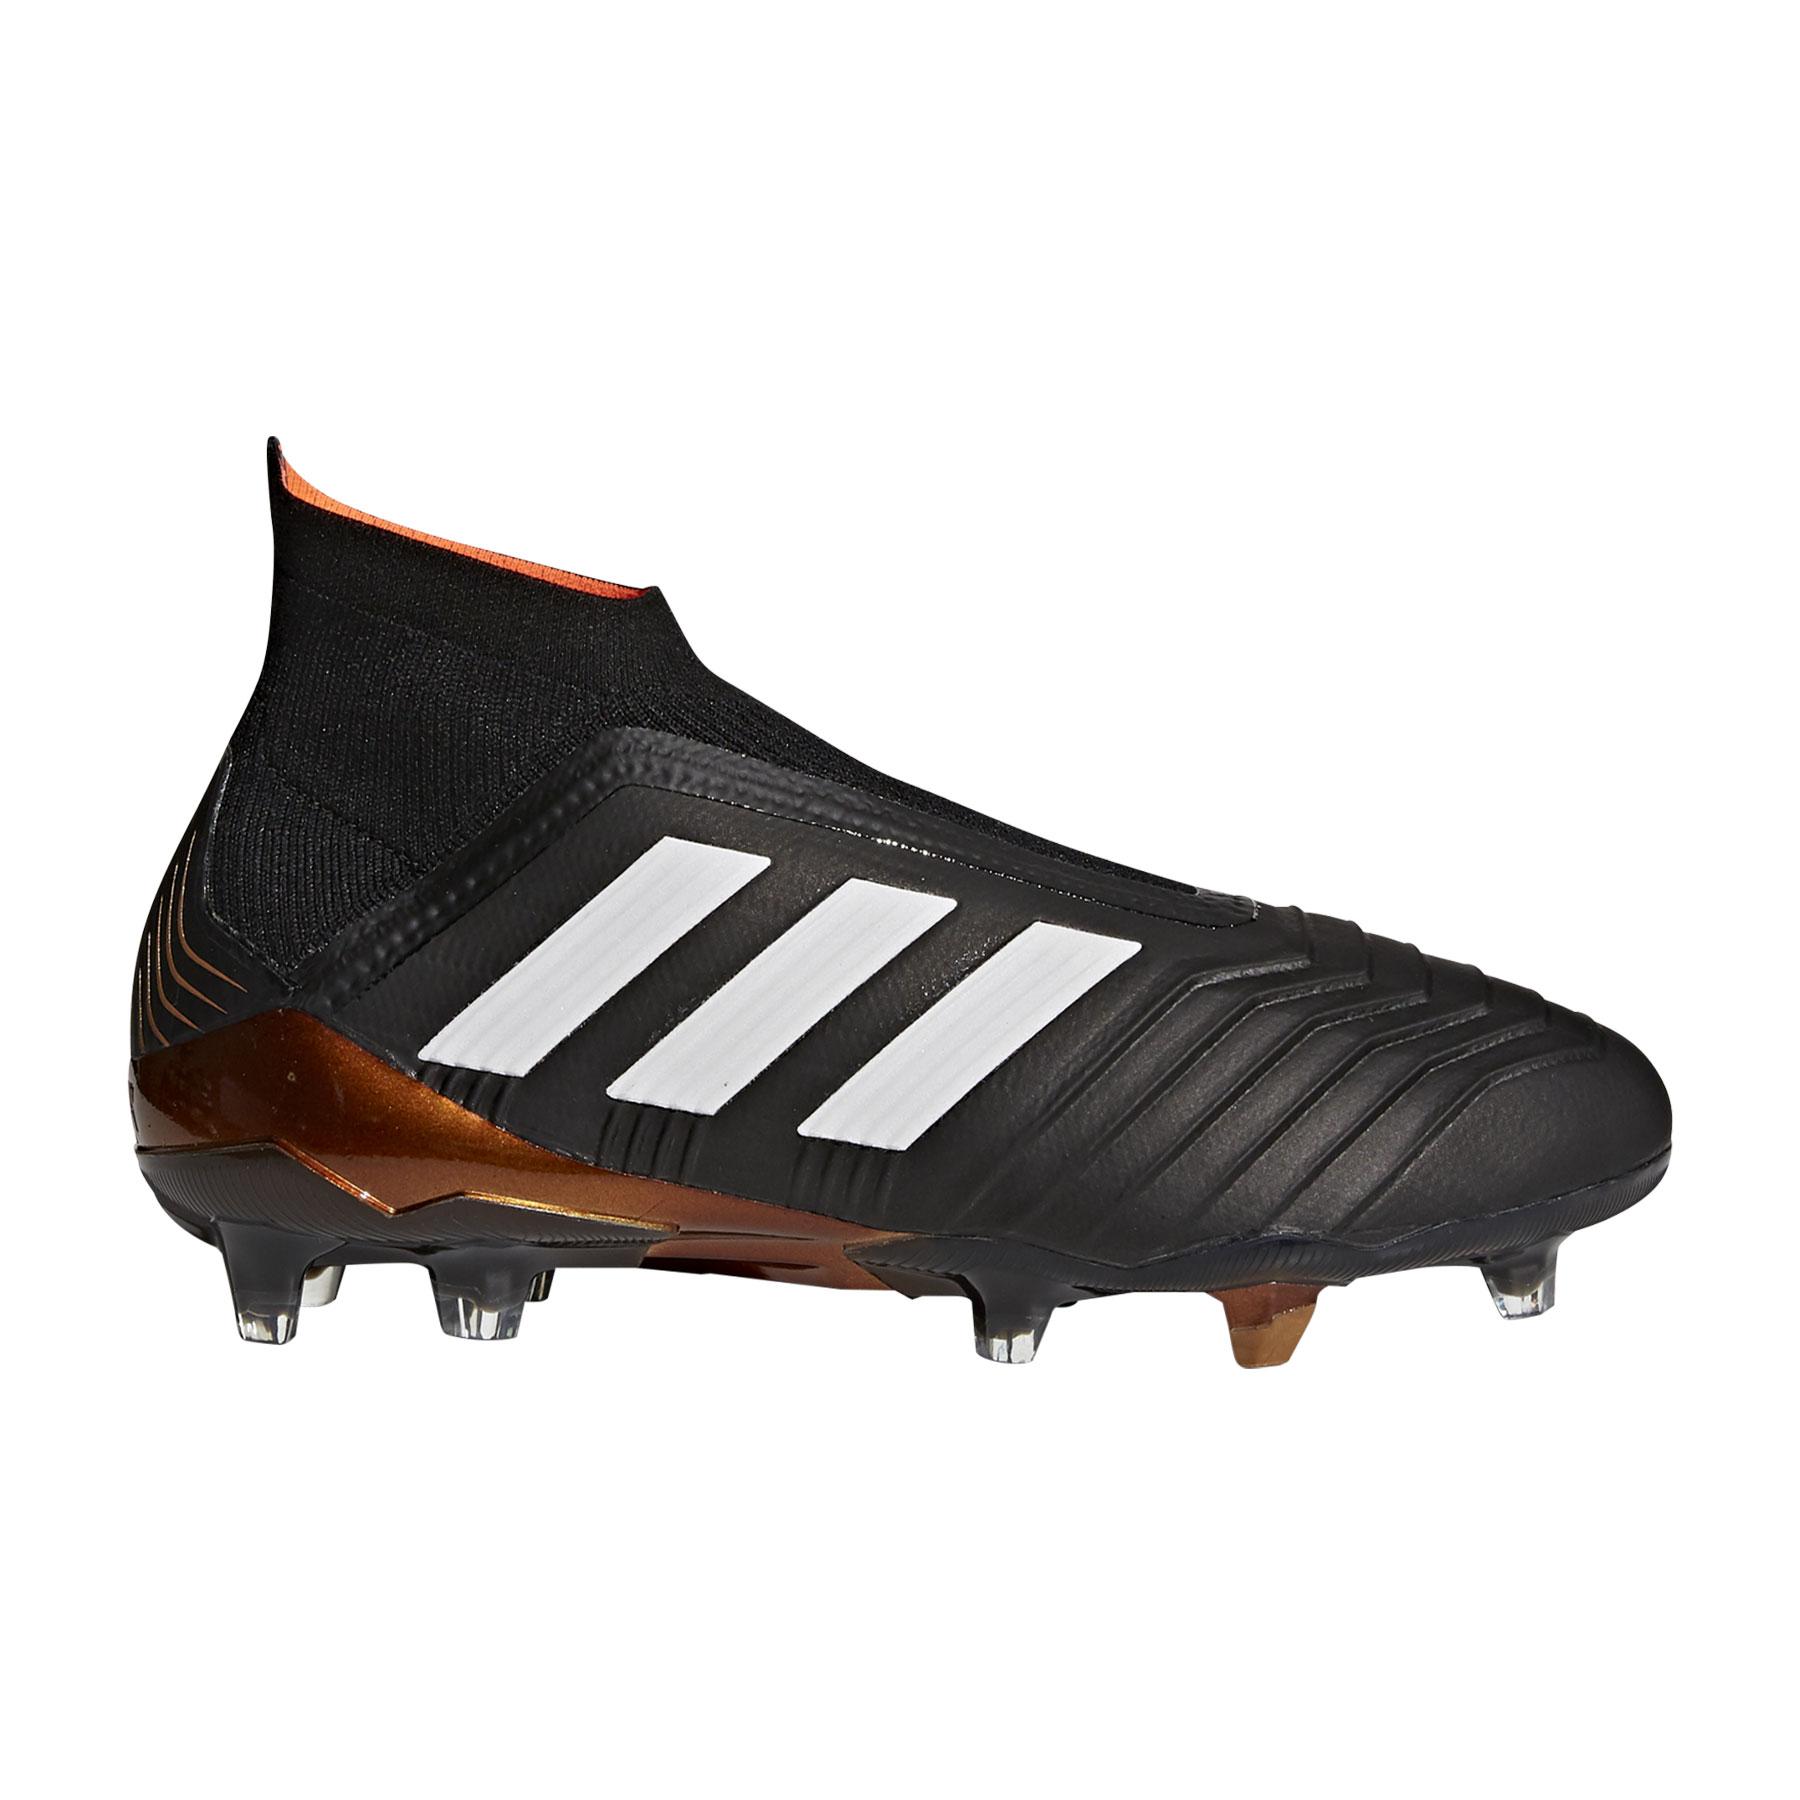 Acquista 2 OFF QUALSIASI scarpe da calcio adidas da bambino